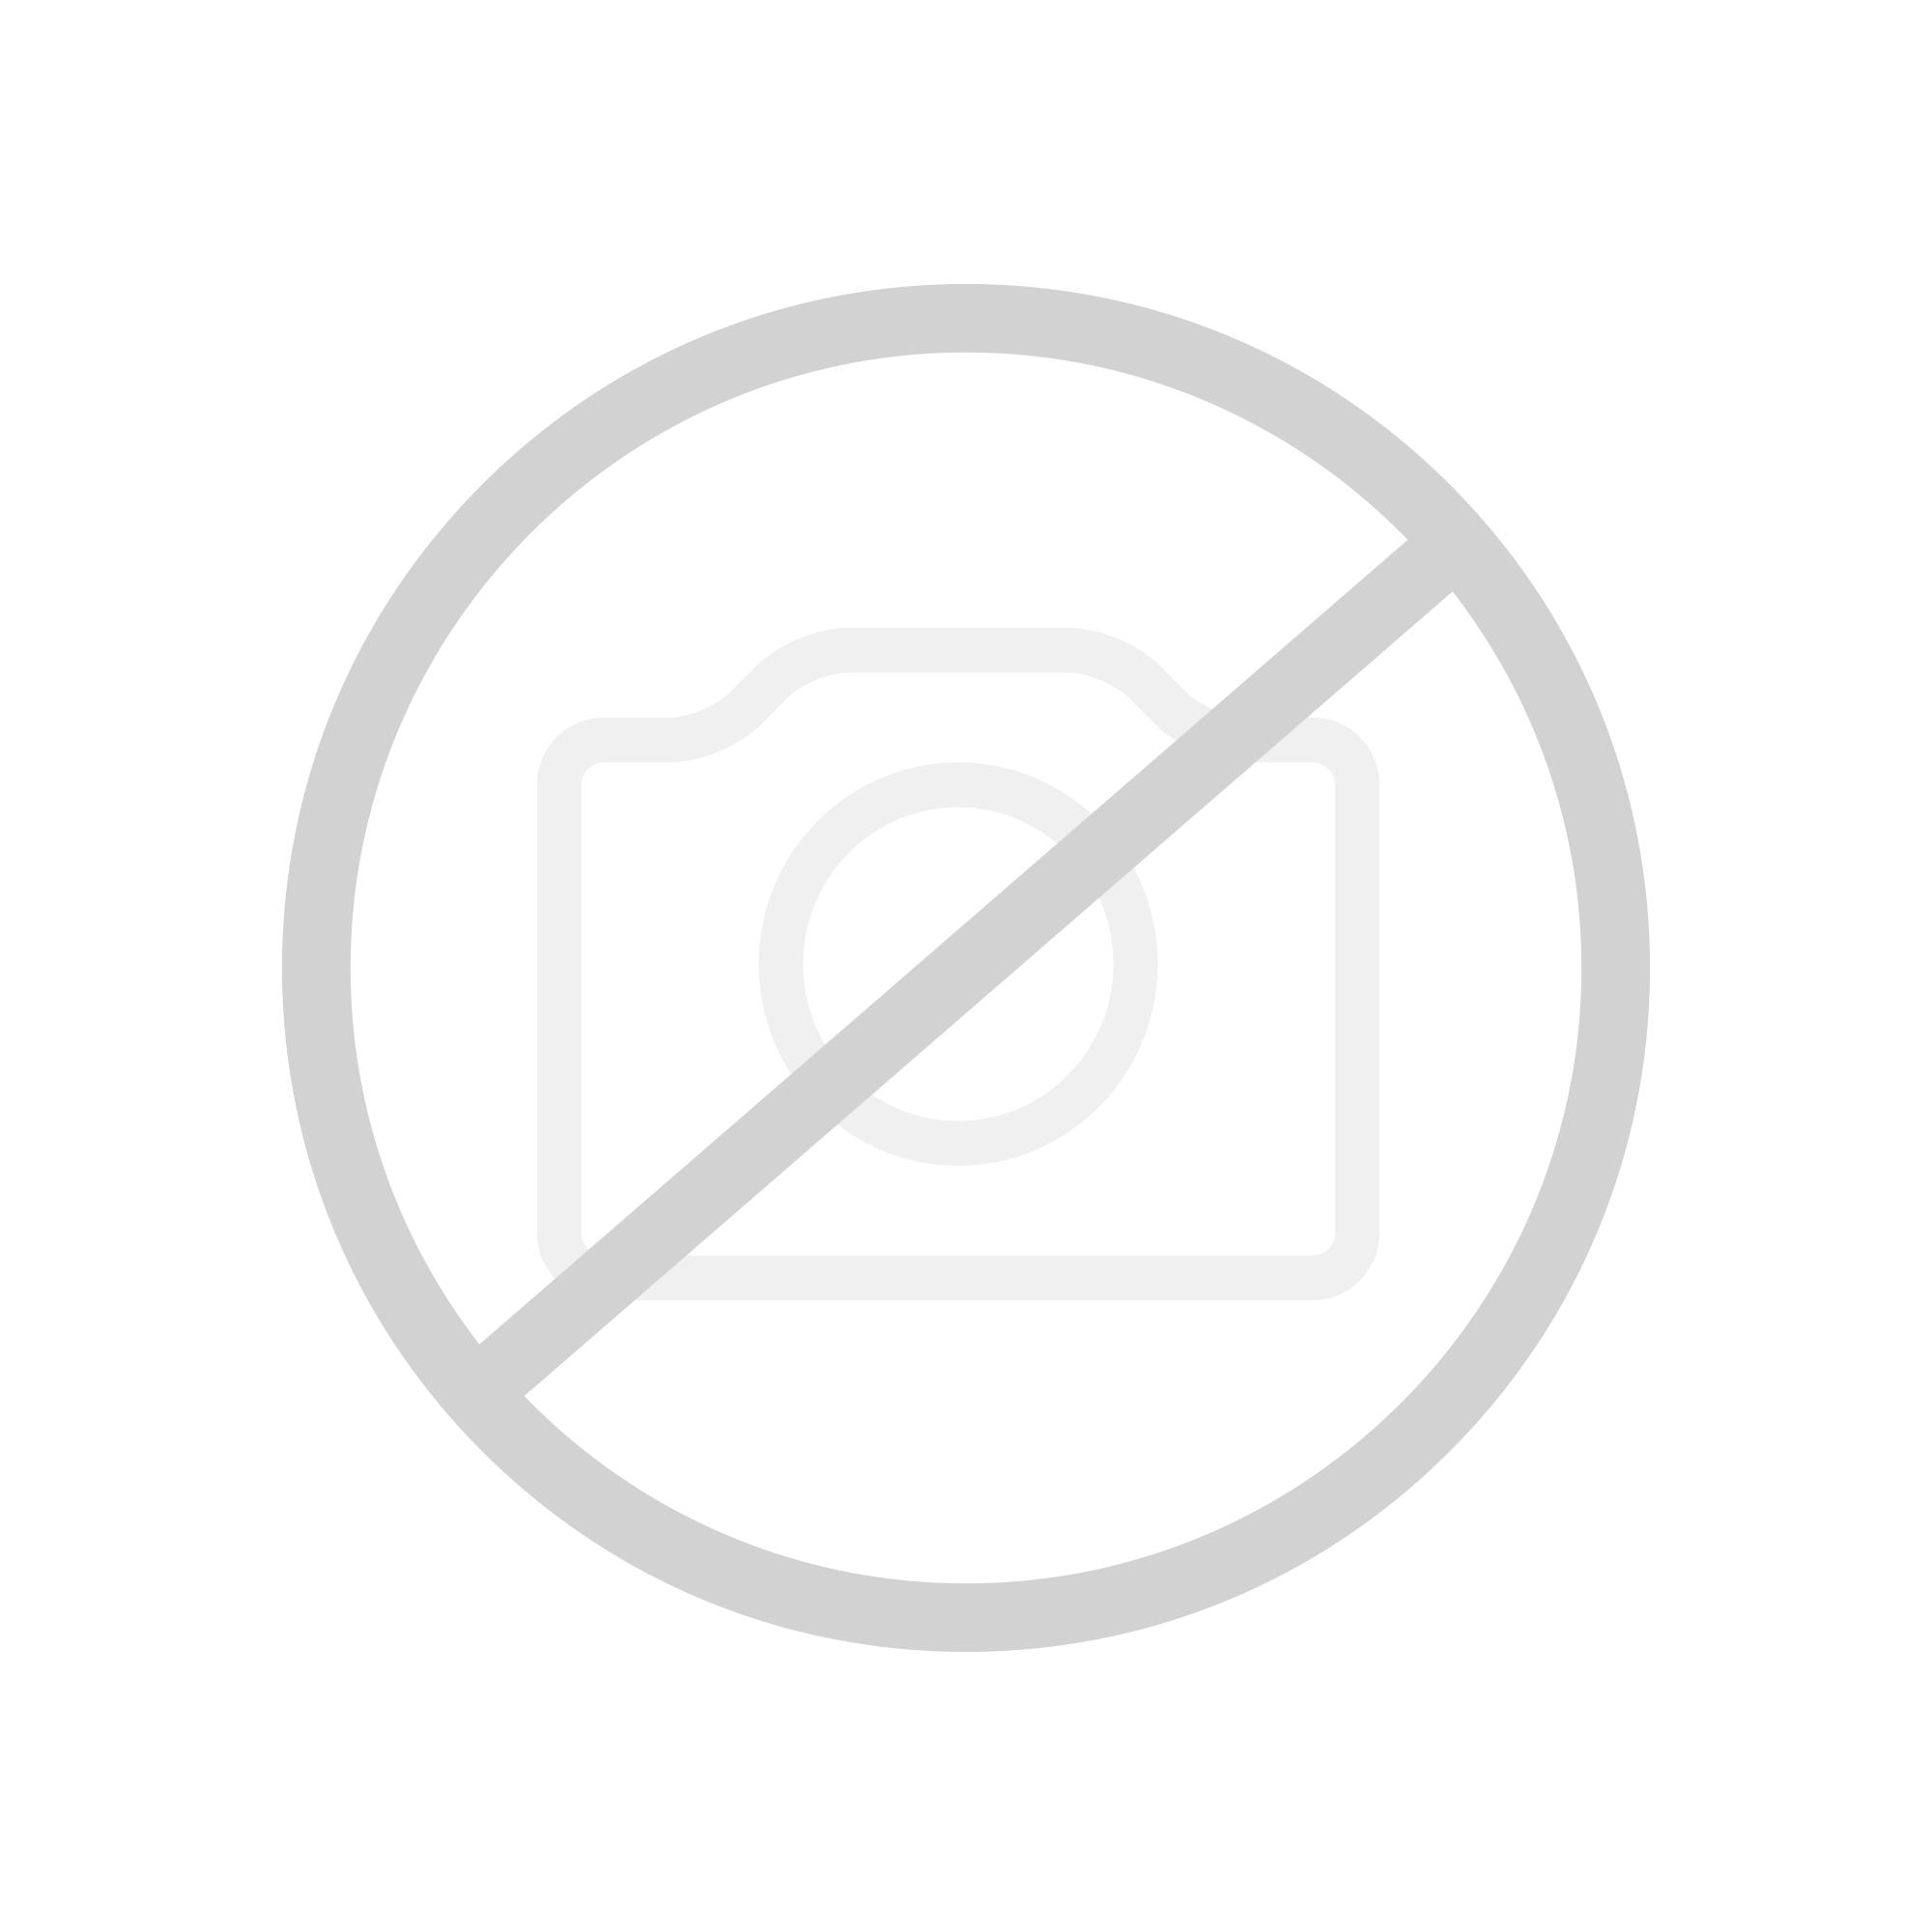 HSK ASP 300 Spiegelschrank   1102060S | Reuter Onlineshop